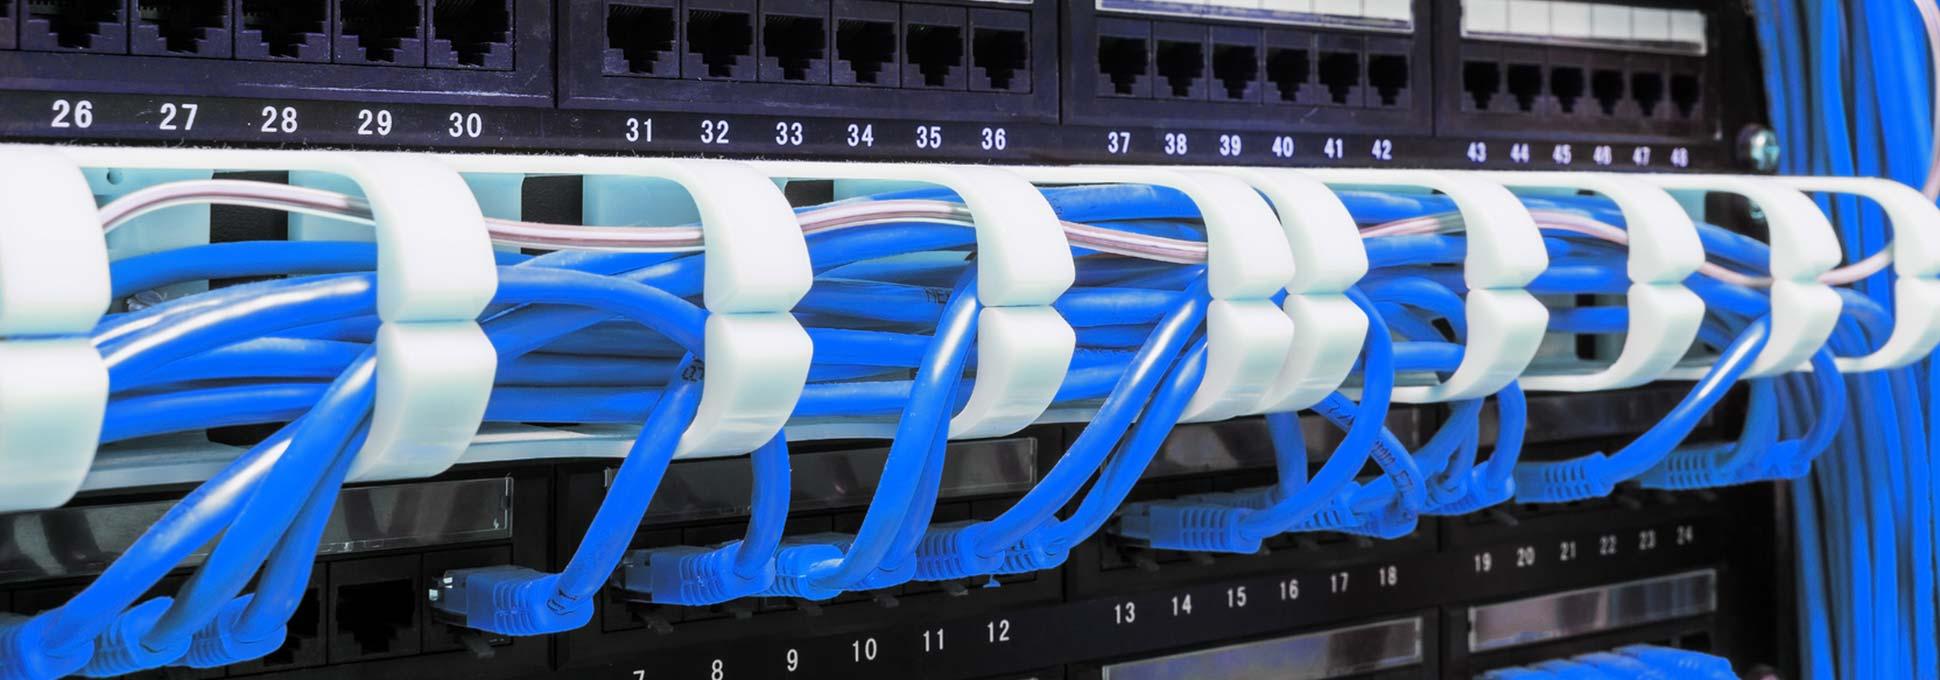 axium-slider-sieci